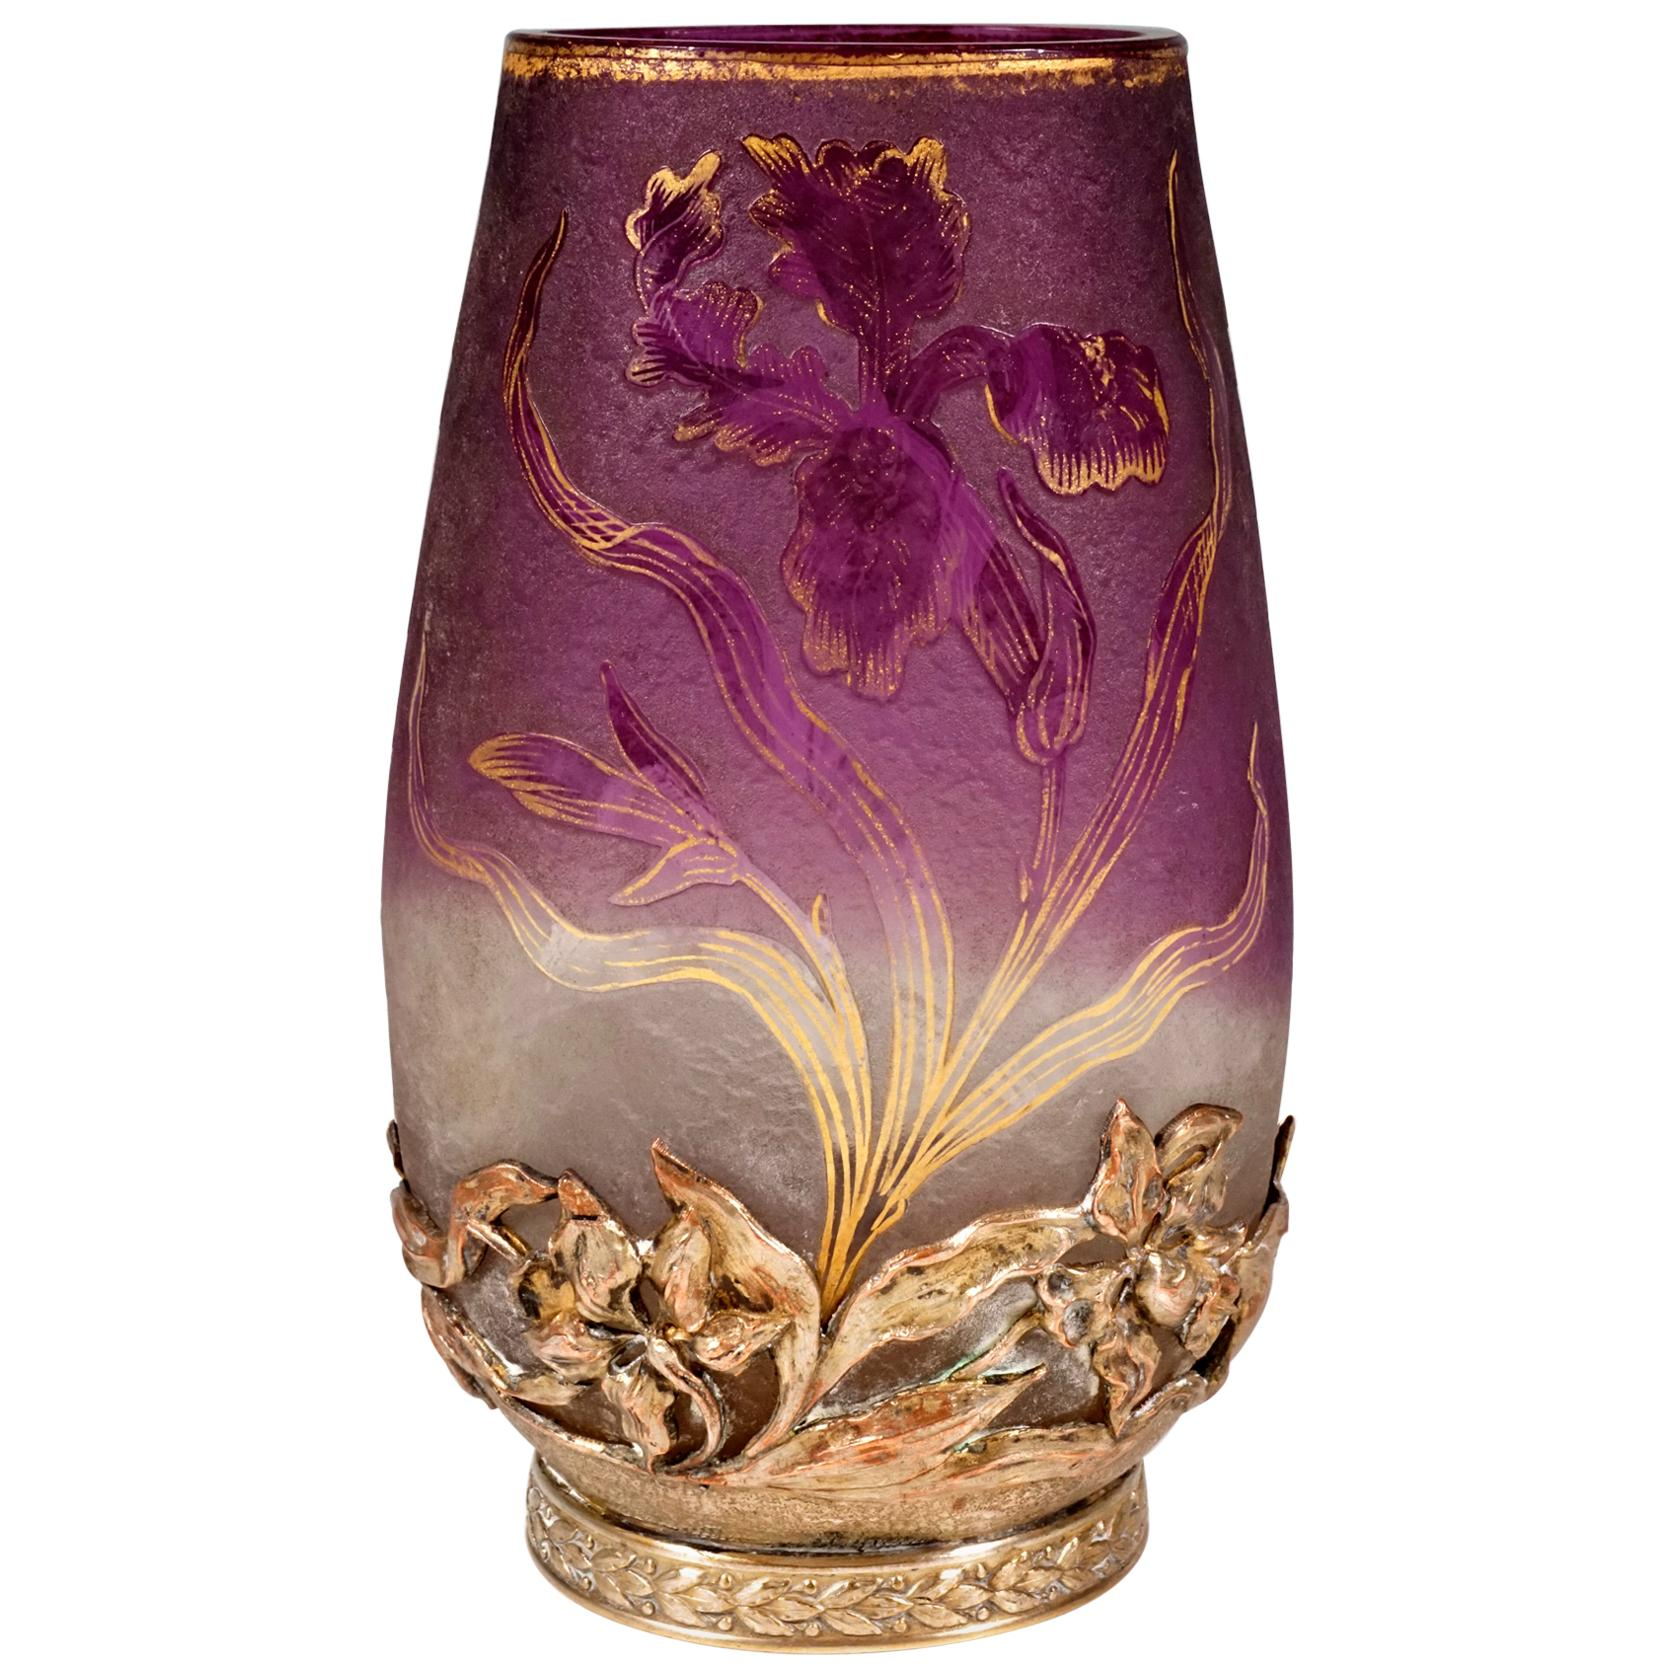 Art Nouveau Cameo Vase with Iris Decor & Mounting Daum Nancy, France, circa 1900